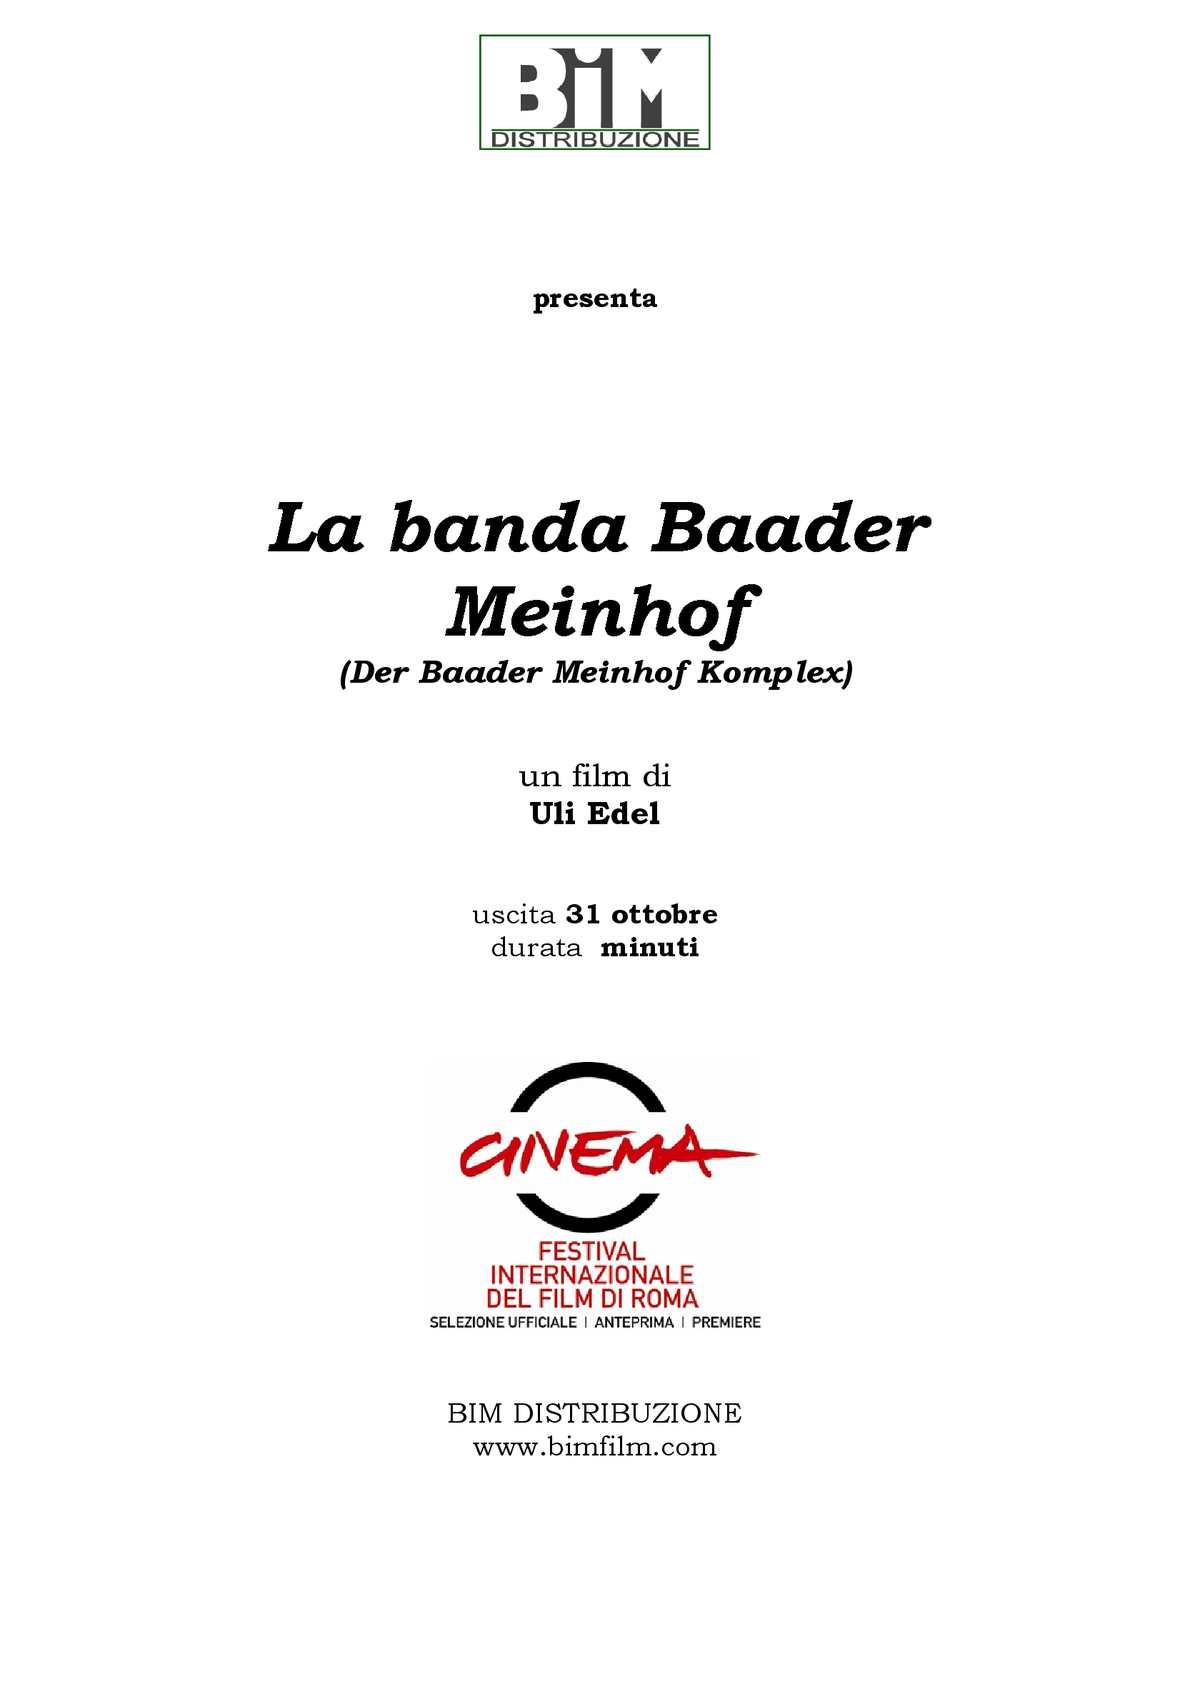 La Banda Bader Meinhof